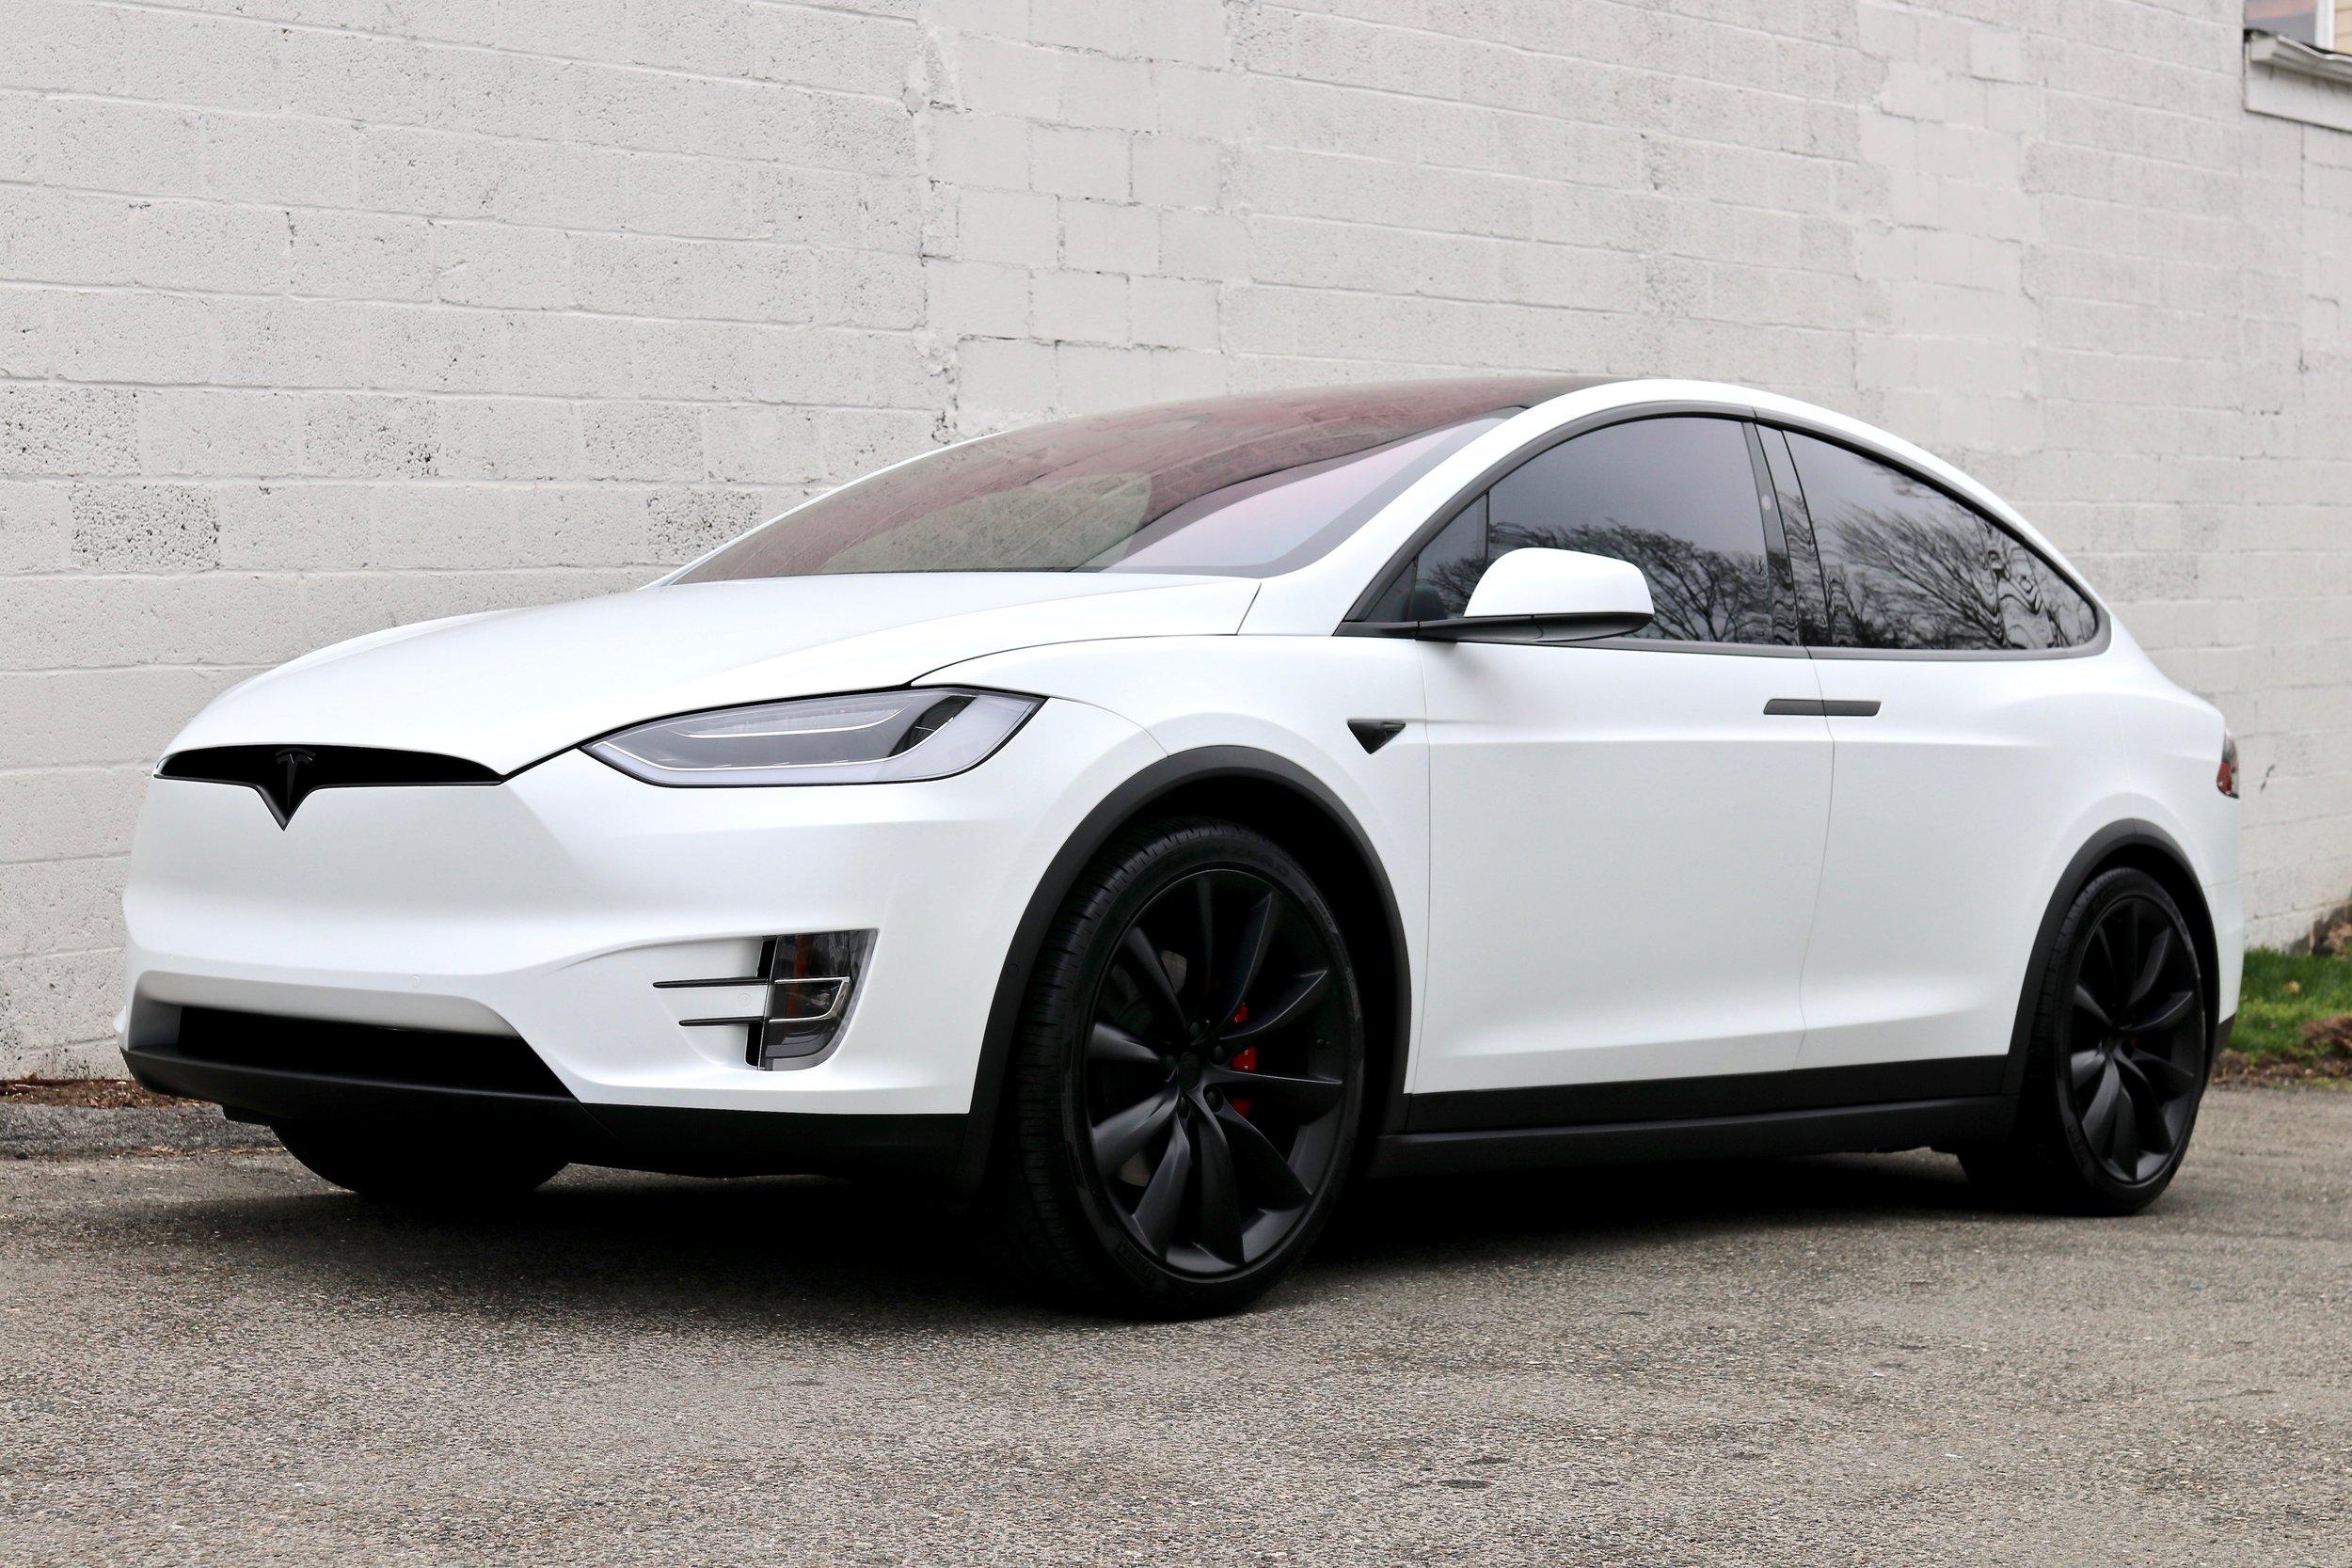 Tesla Model X Full Body Wrap In Xpel Stealth Ppf And Cquartz Professional Darien Detail